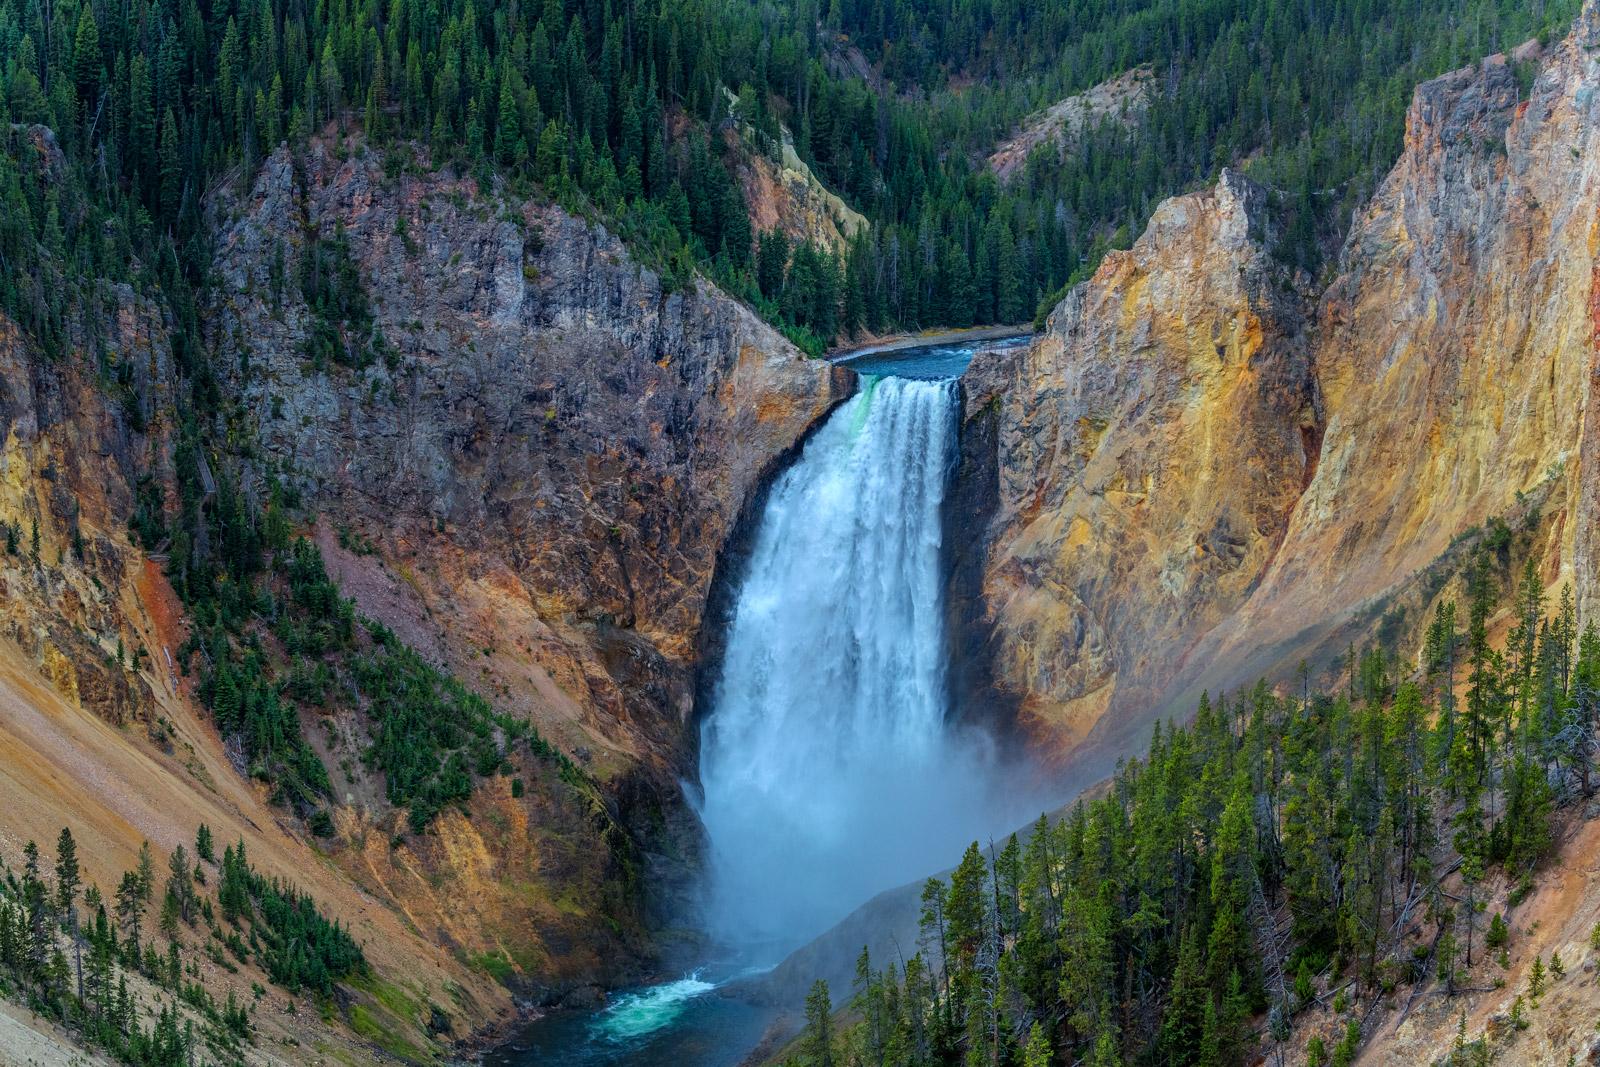 Wyoming, Yellowstone, National Park, Grand Canyon, Falls, Yellowstone Falls, limited edition, photograph, fine art, landscape, photo